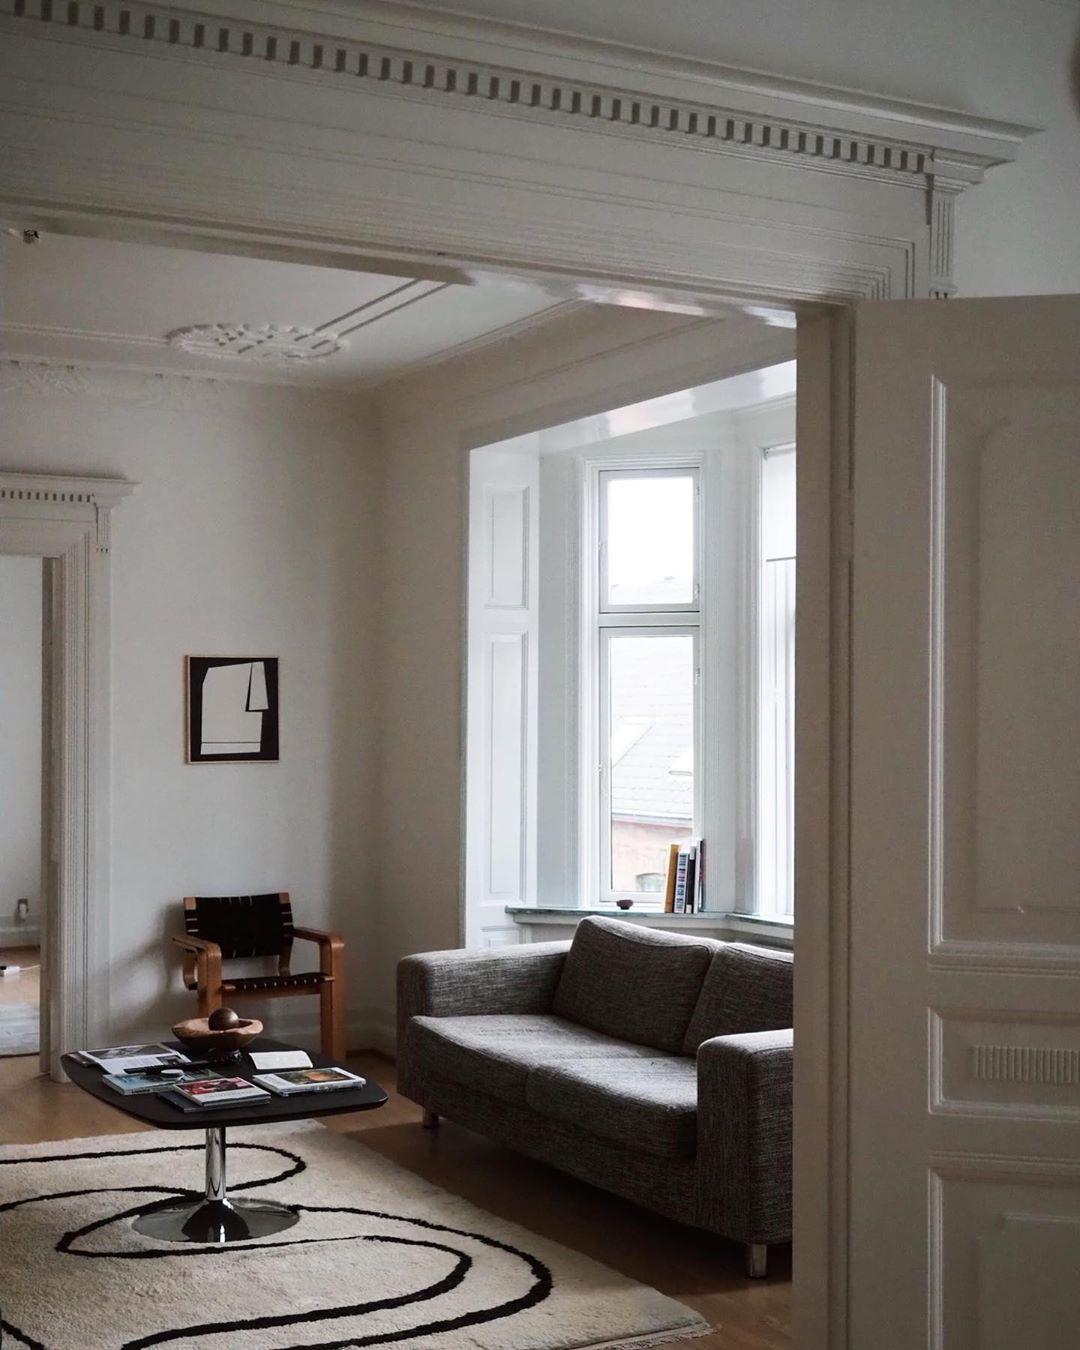 Saturday Morning Light In The Home Studi Moderndesign - Architecture